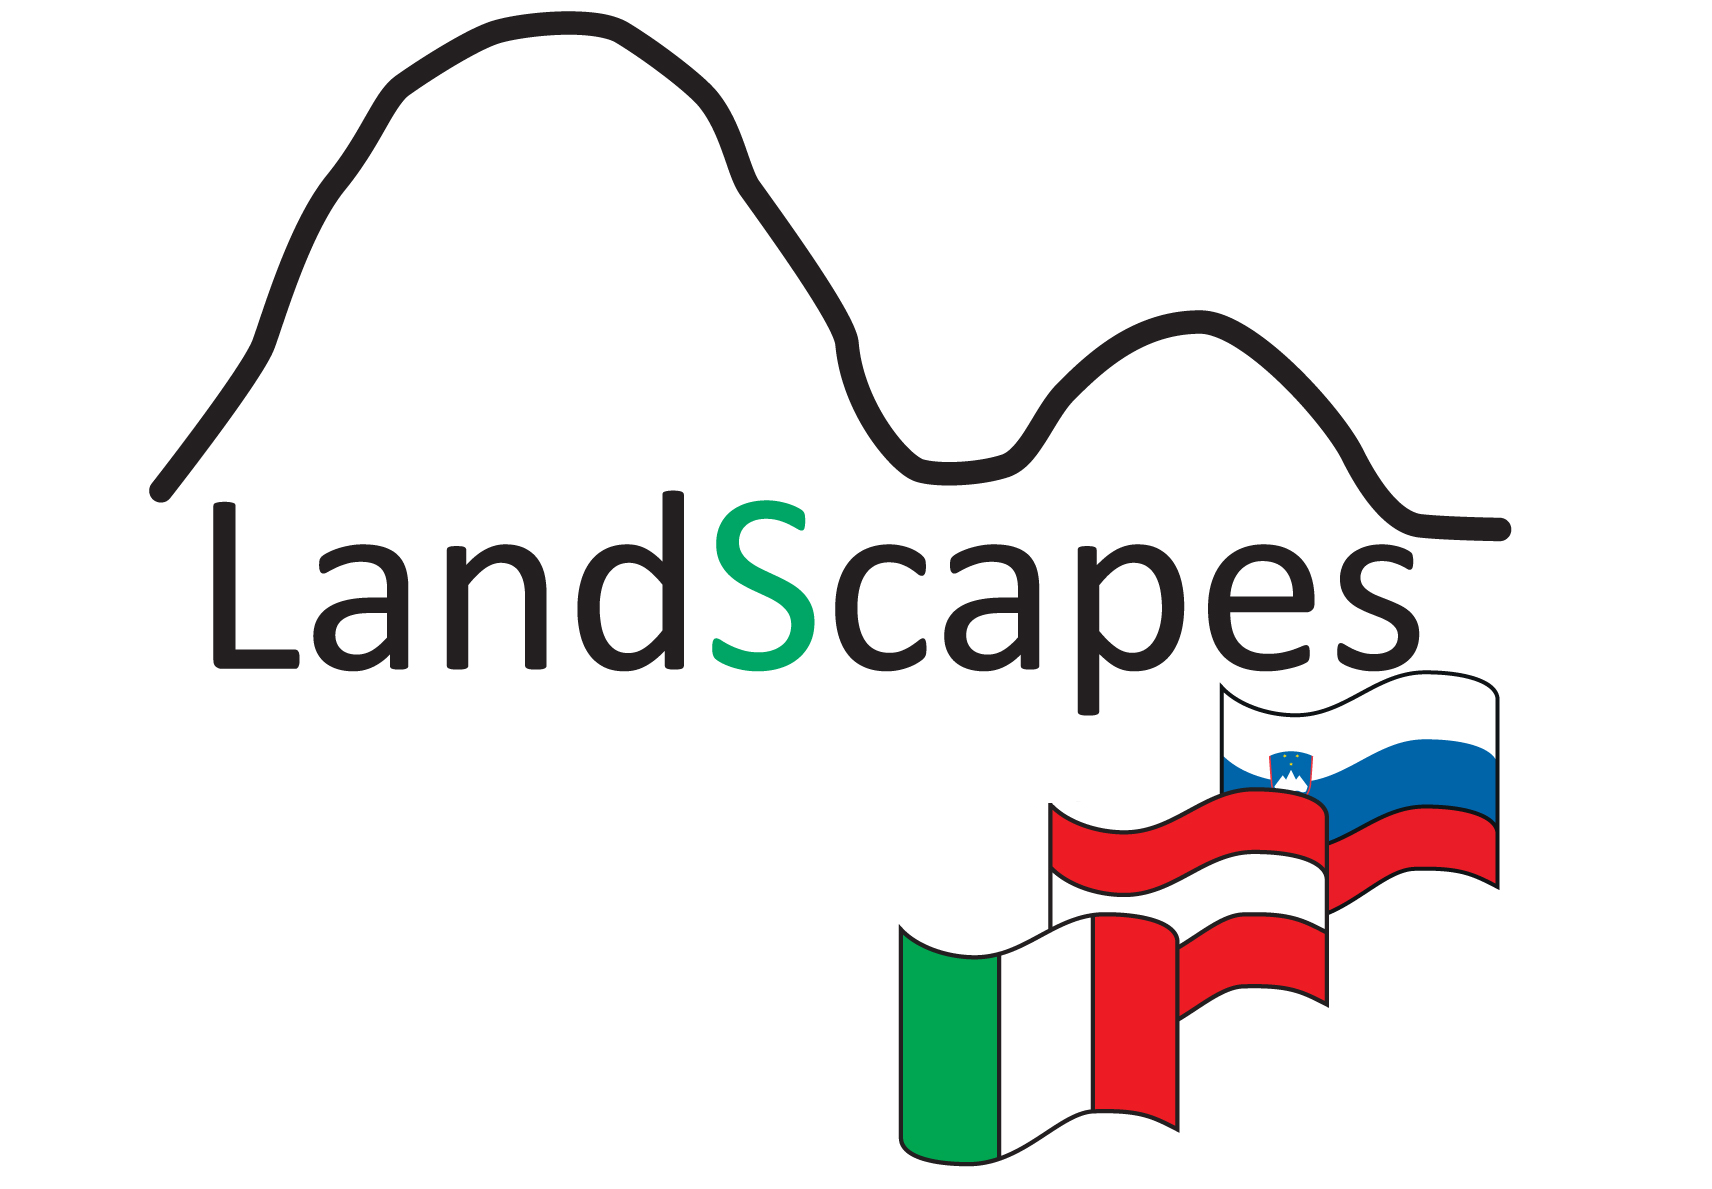 LOGO LandScapes copia